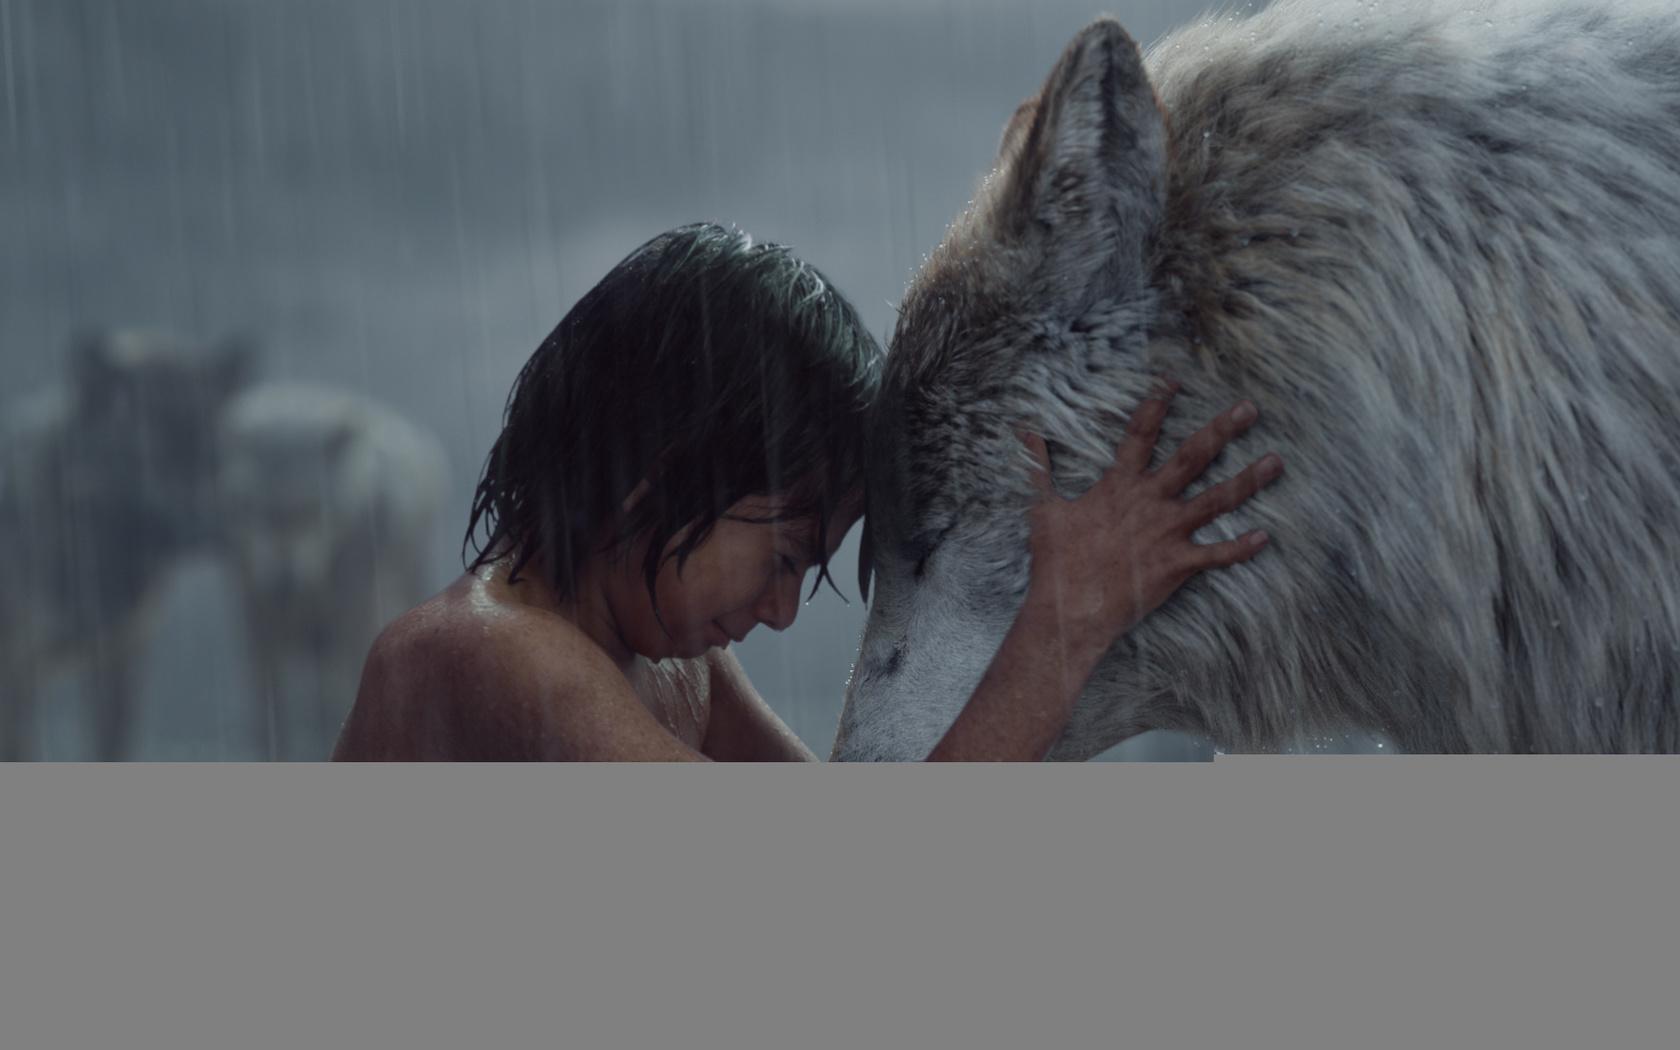 маугли, волк, фильм